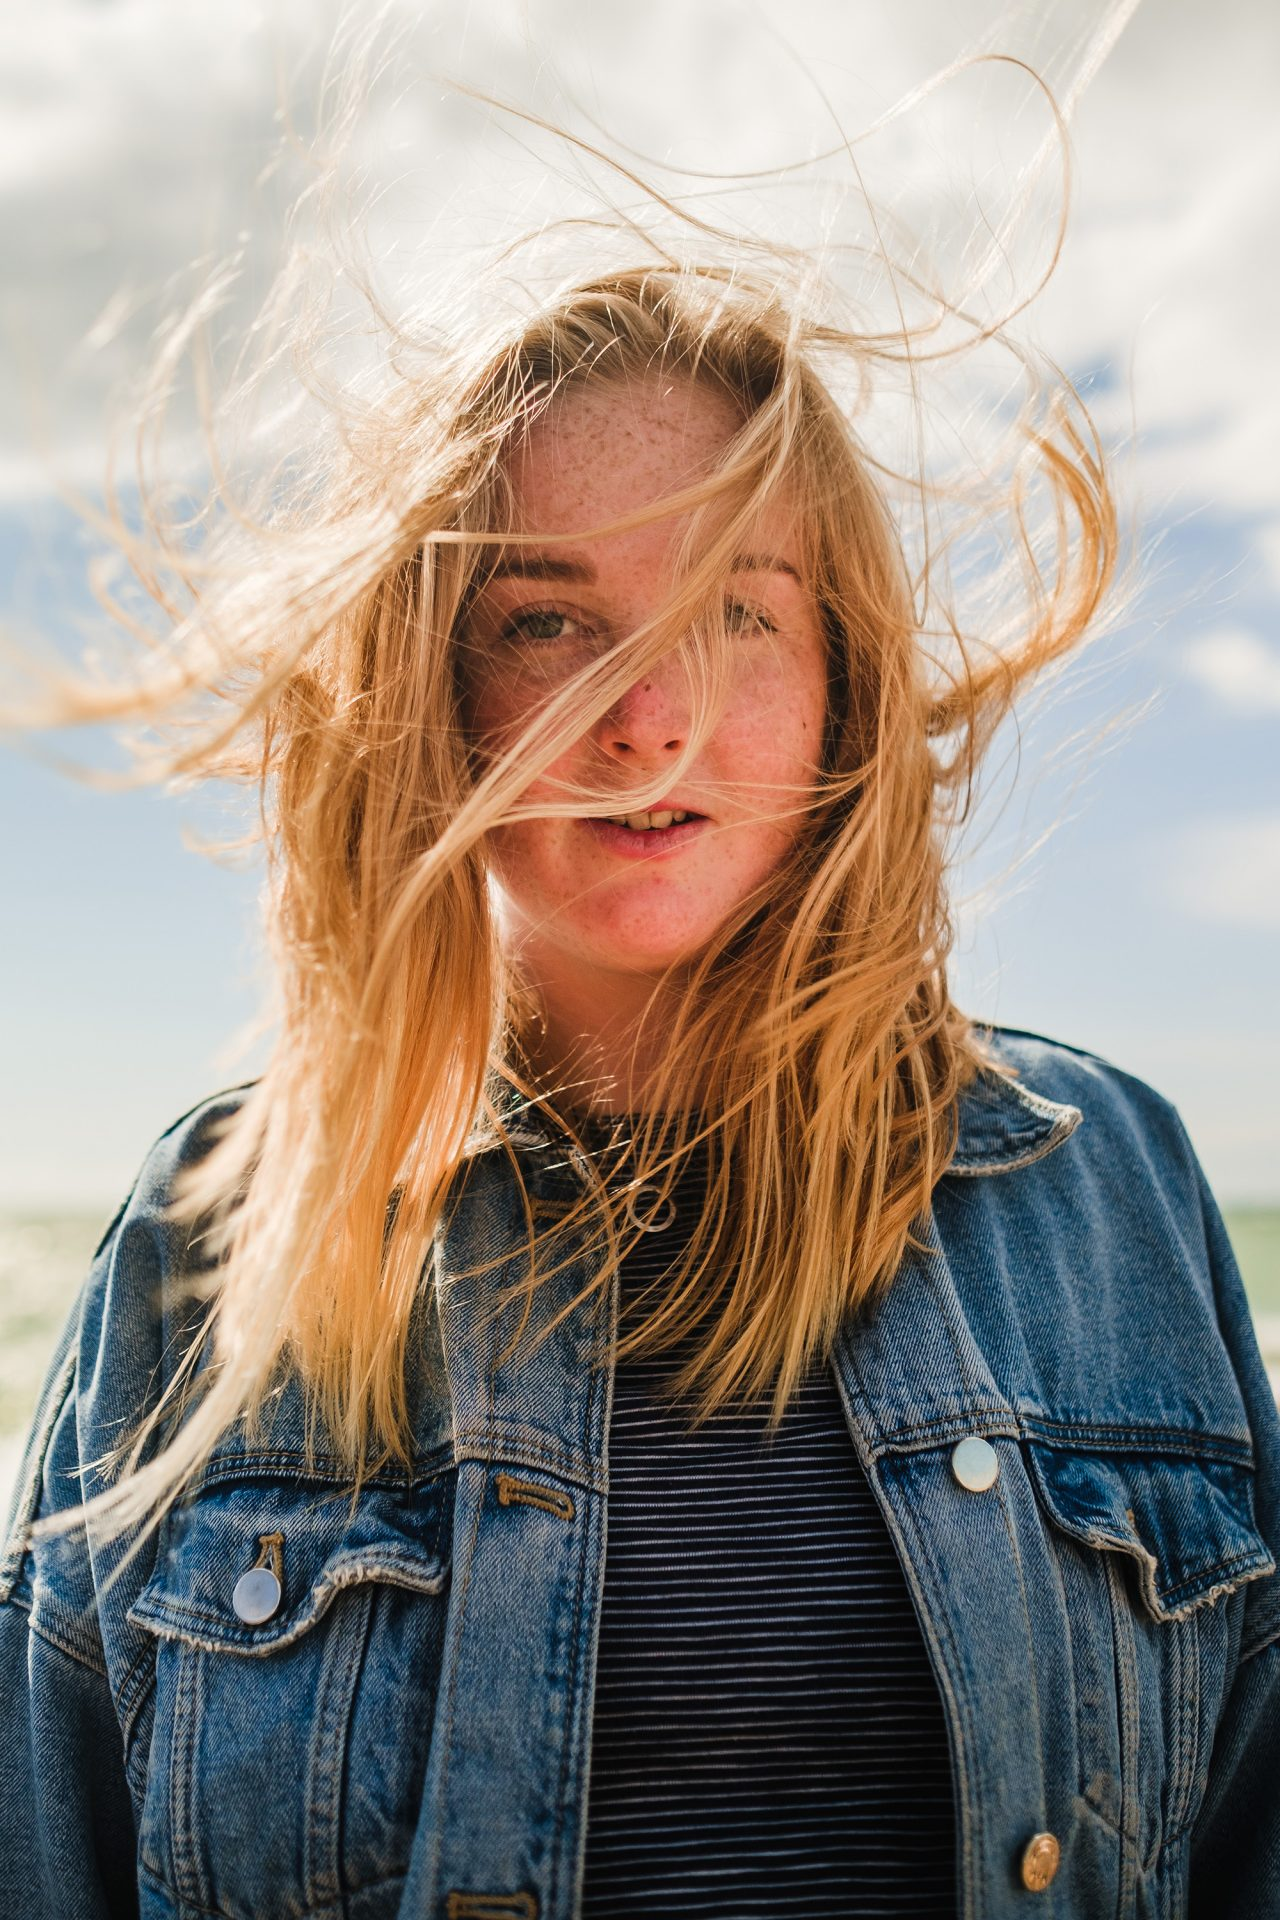 wild beach hair in the wind